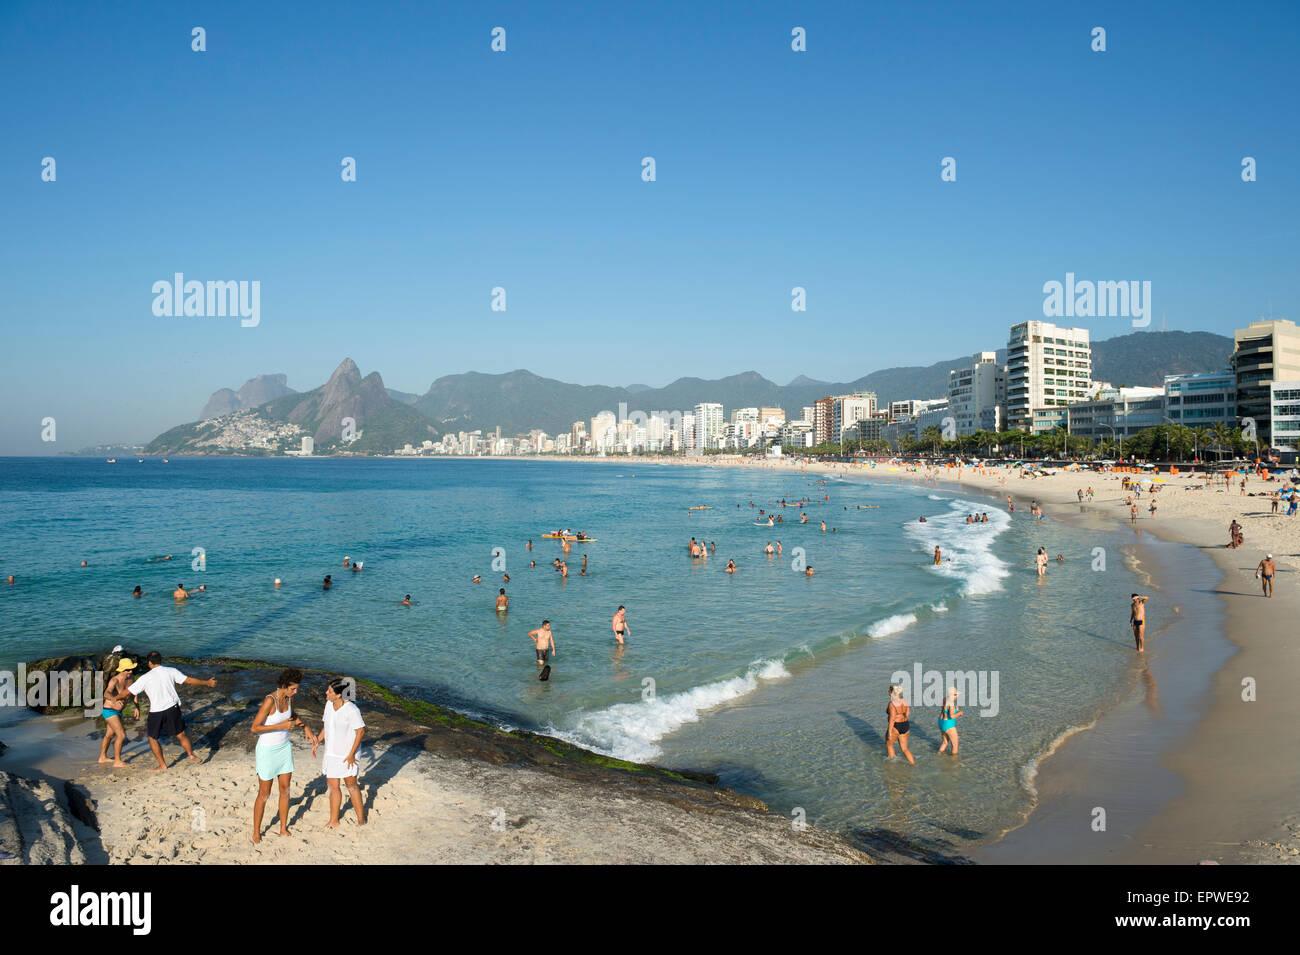 RIO DE JANEIRO, BRAZIL - JANUARY 17, 2015: Beachgoers relax on on the rocks at the Arpoador end of Ipanema Beach. - Stock Image